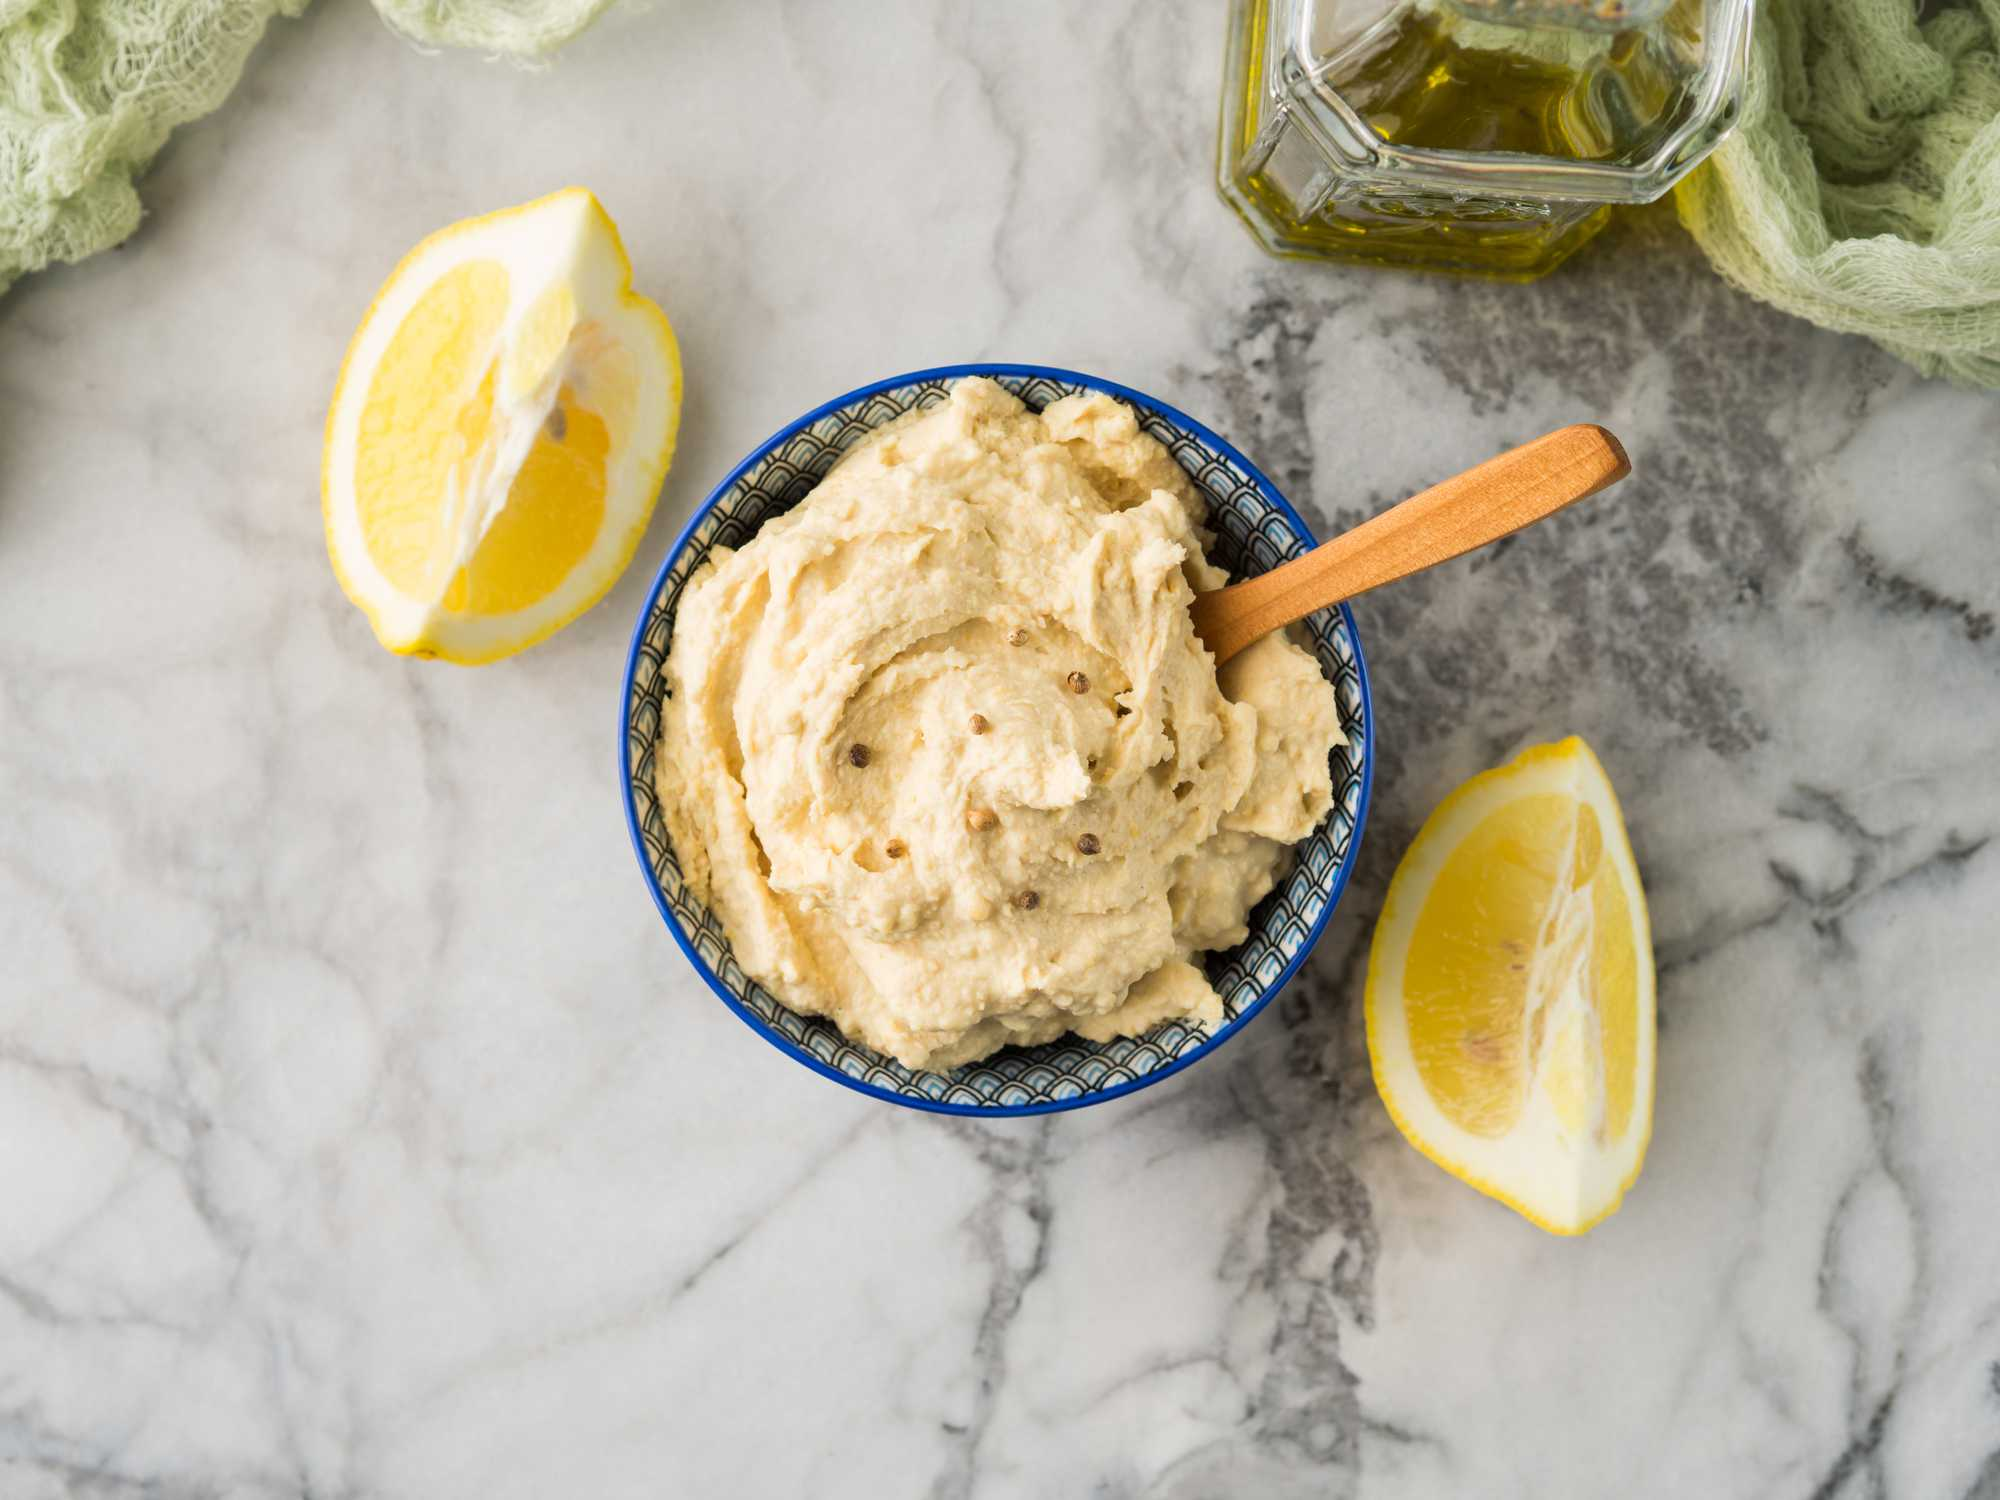 Lemon and Garlic Hummus